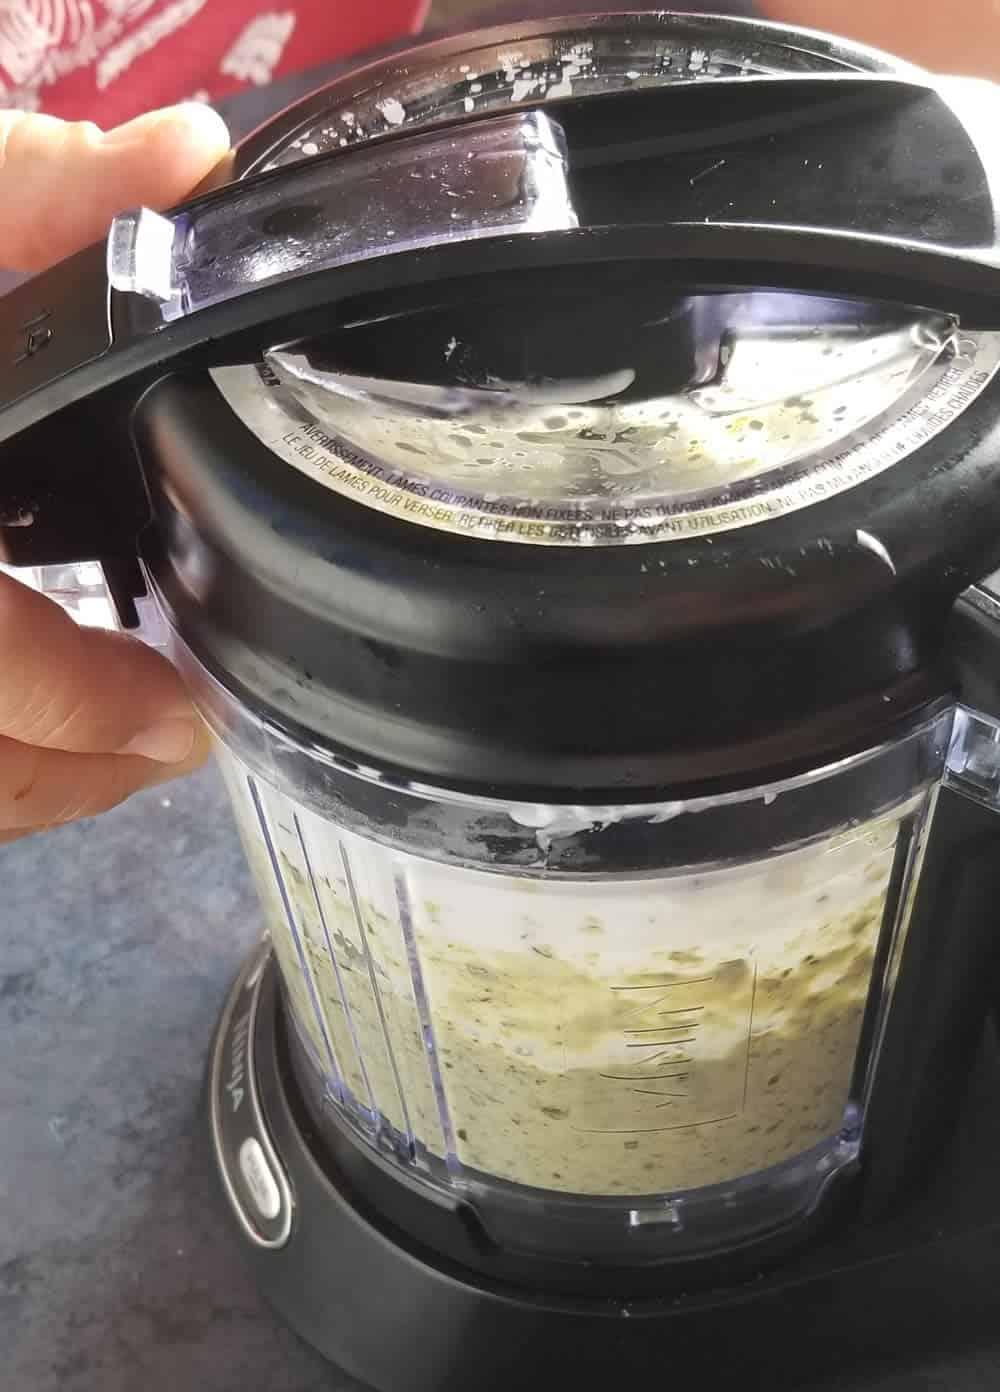 Processing the Poblano Cream Sauce